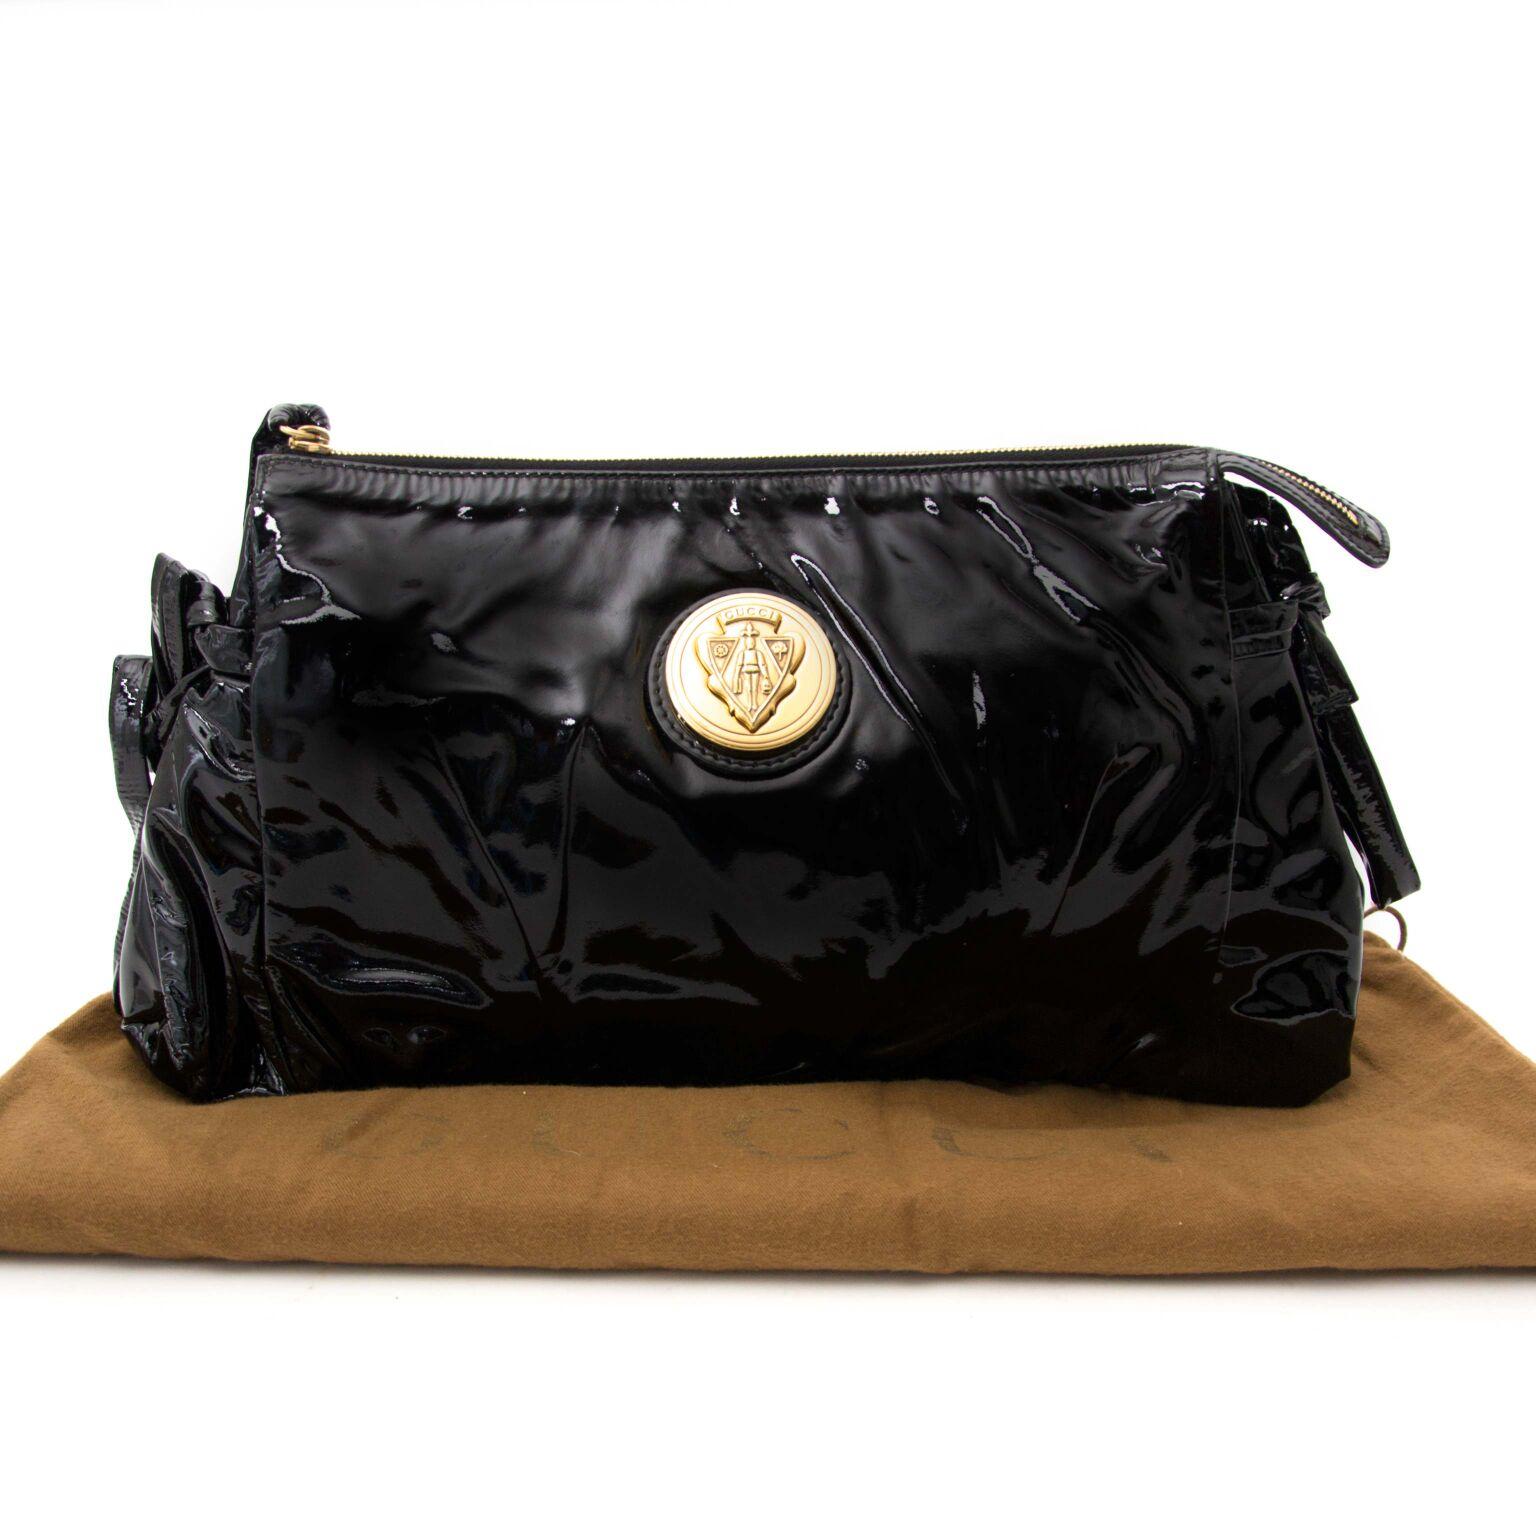 Prachtige unieke Gucci nu te koop op de veilige vintage webshop Labellov.com